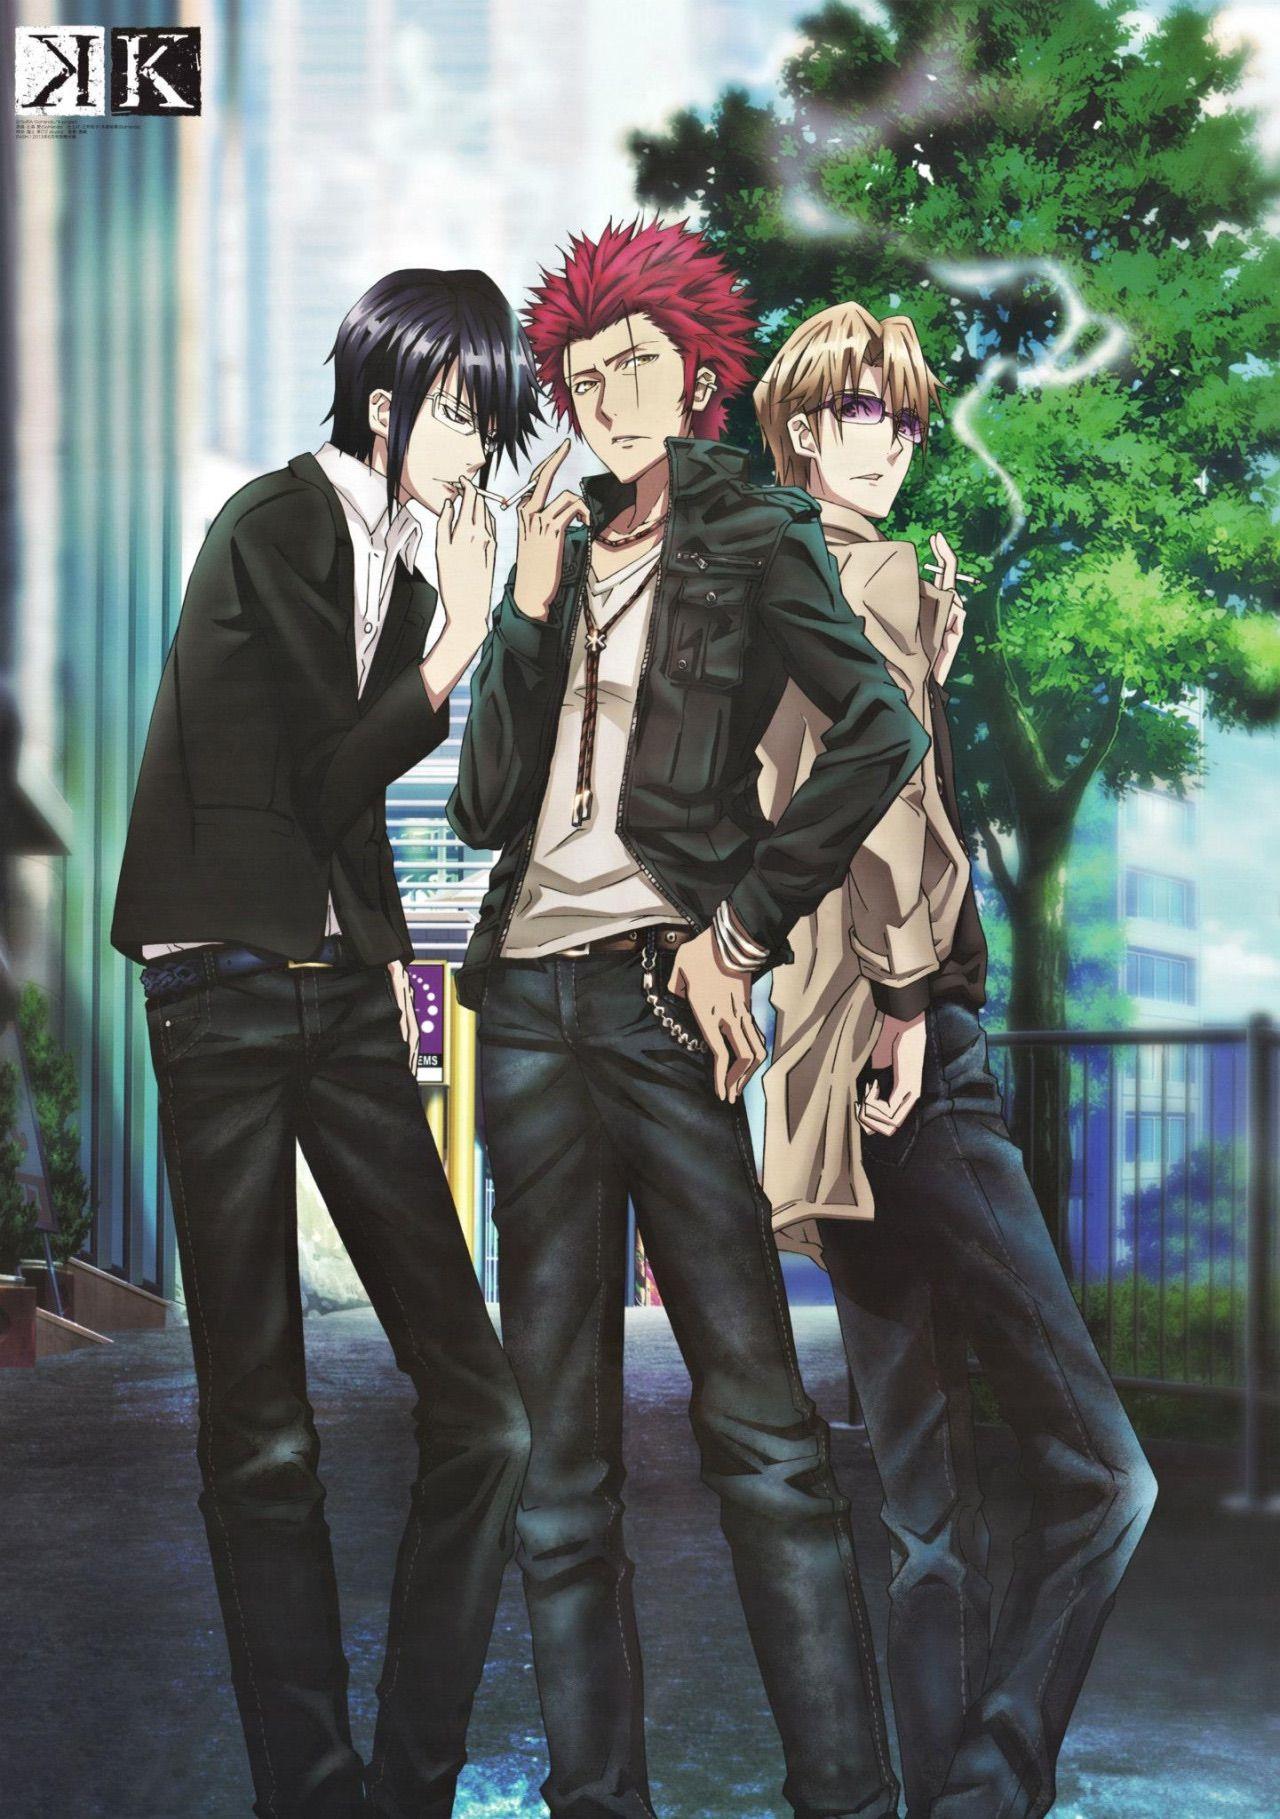 Munakata & Suoh & Kusanagi | K Project #anime | Cause Anime